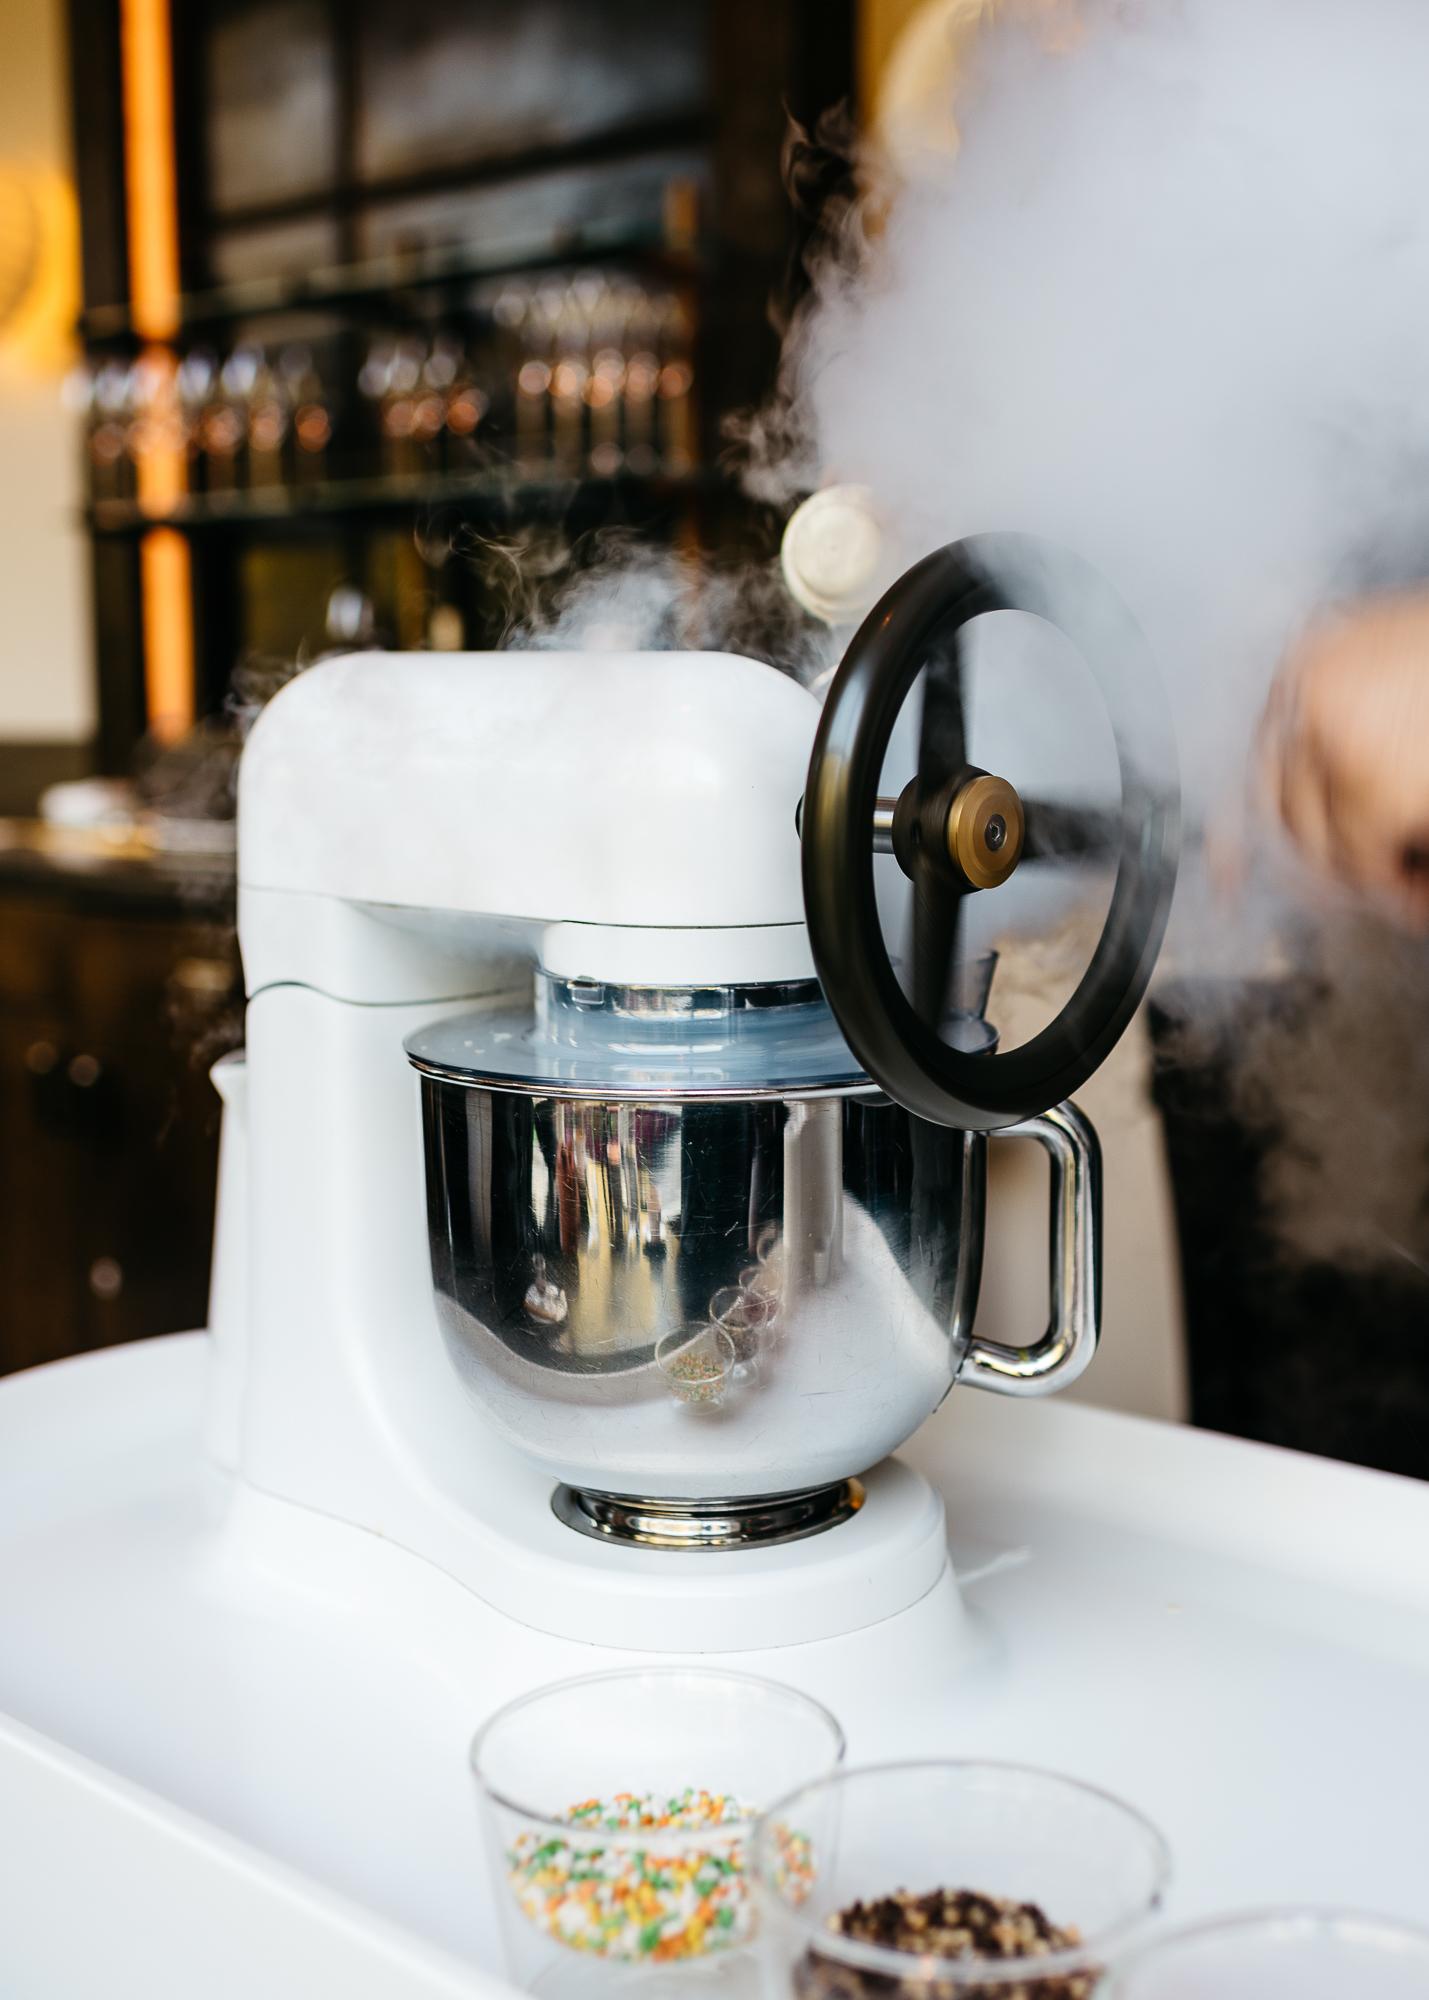 Liquid nitrogen vanilla ice cream made to order at Dinner by Heston Blumenthal